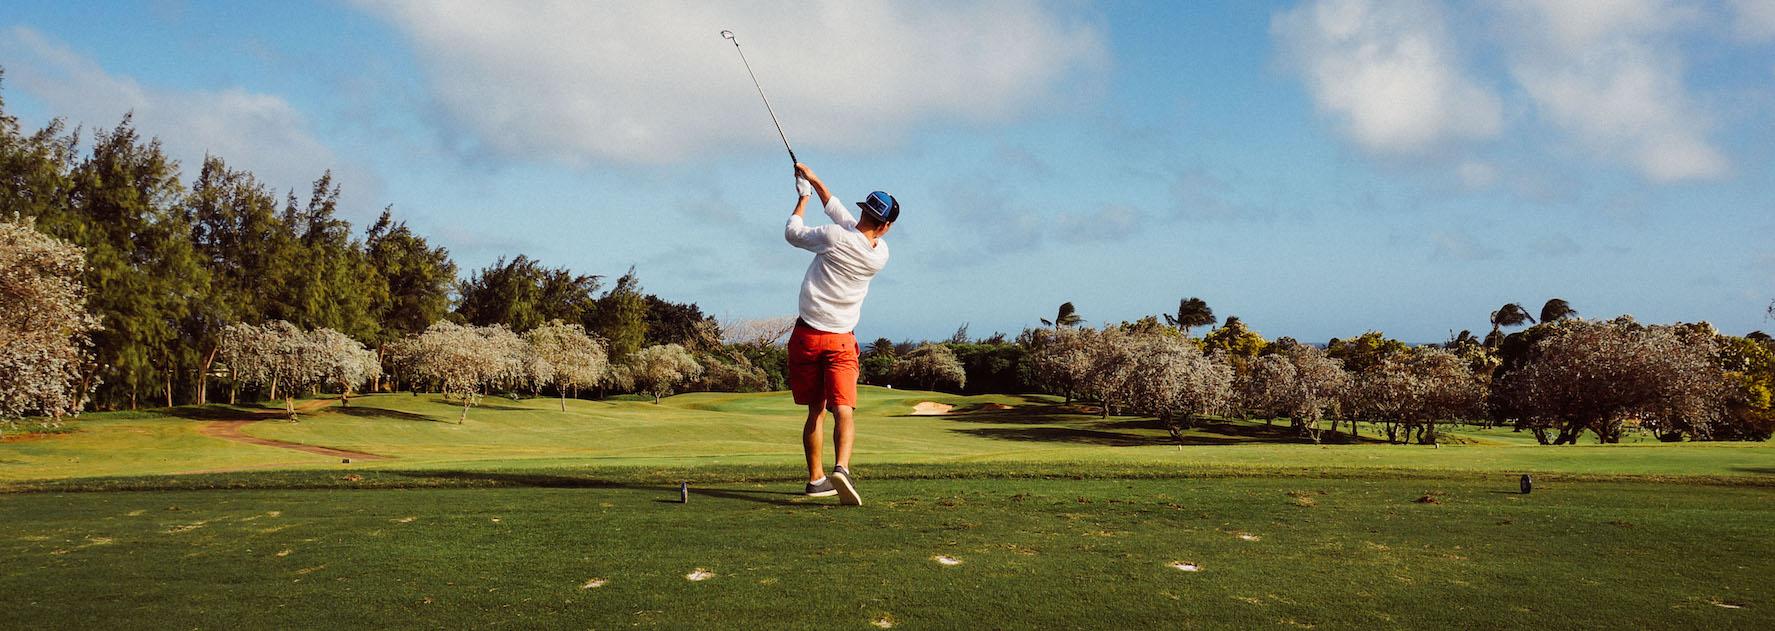 Golf Outing Header Placeholder Image